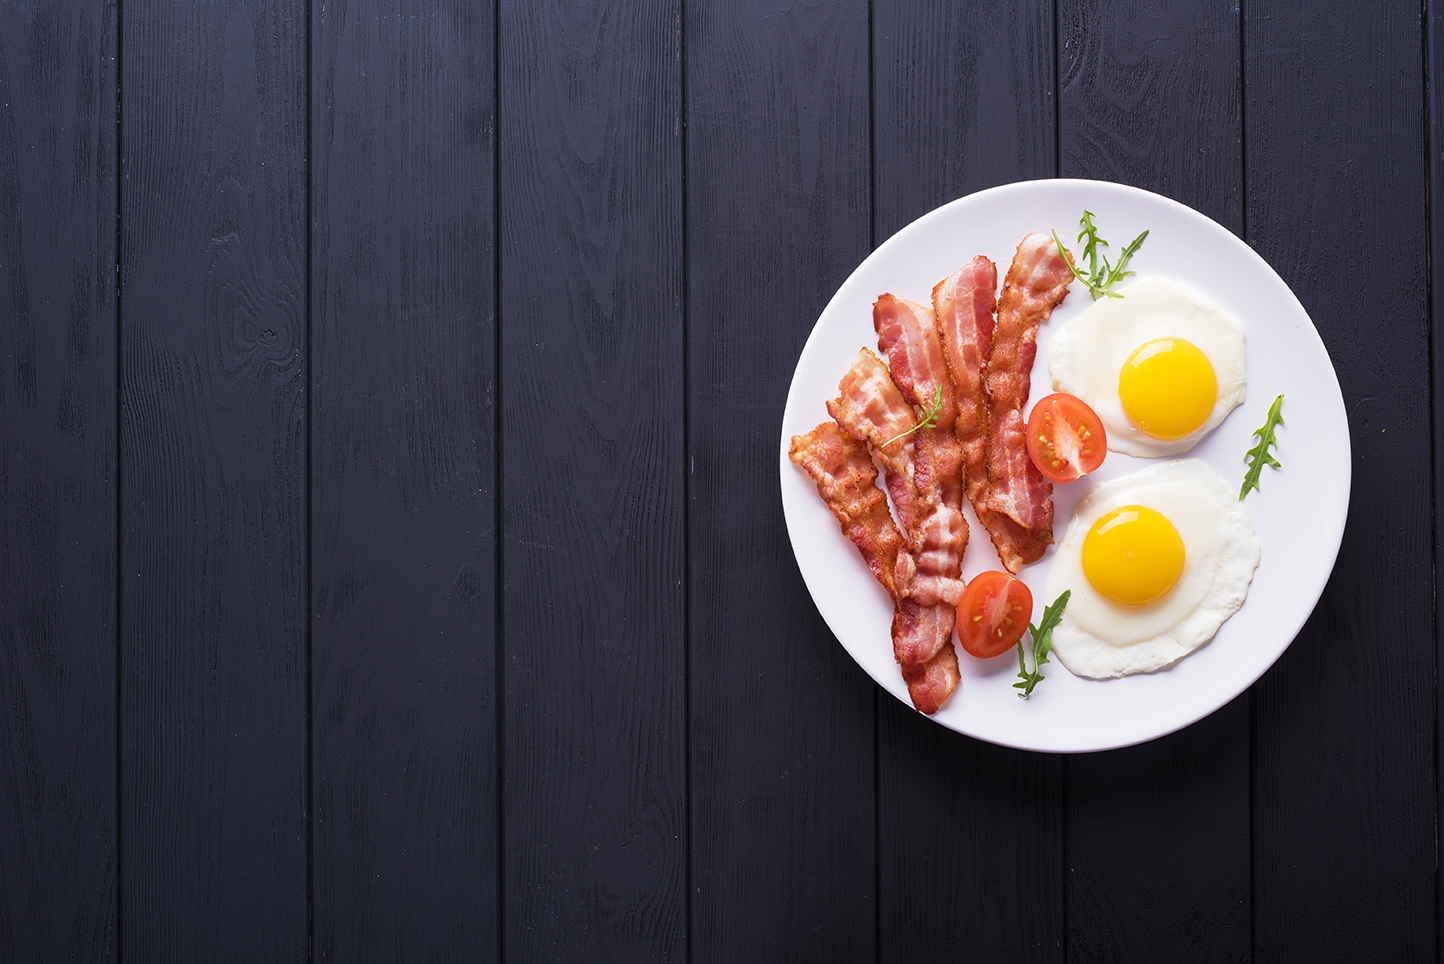 Ketogene Frühstücksrezepte: Bacon and Eggs